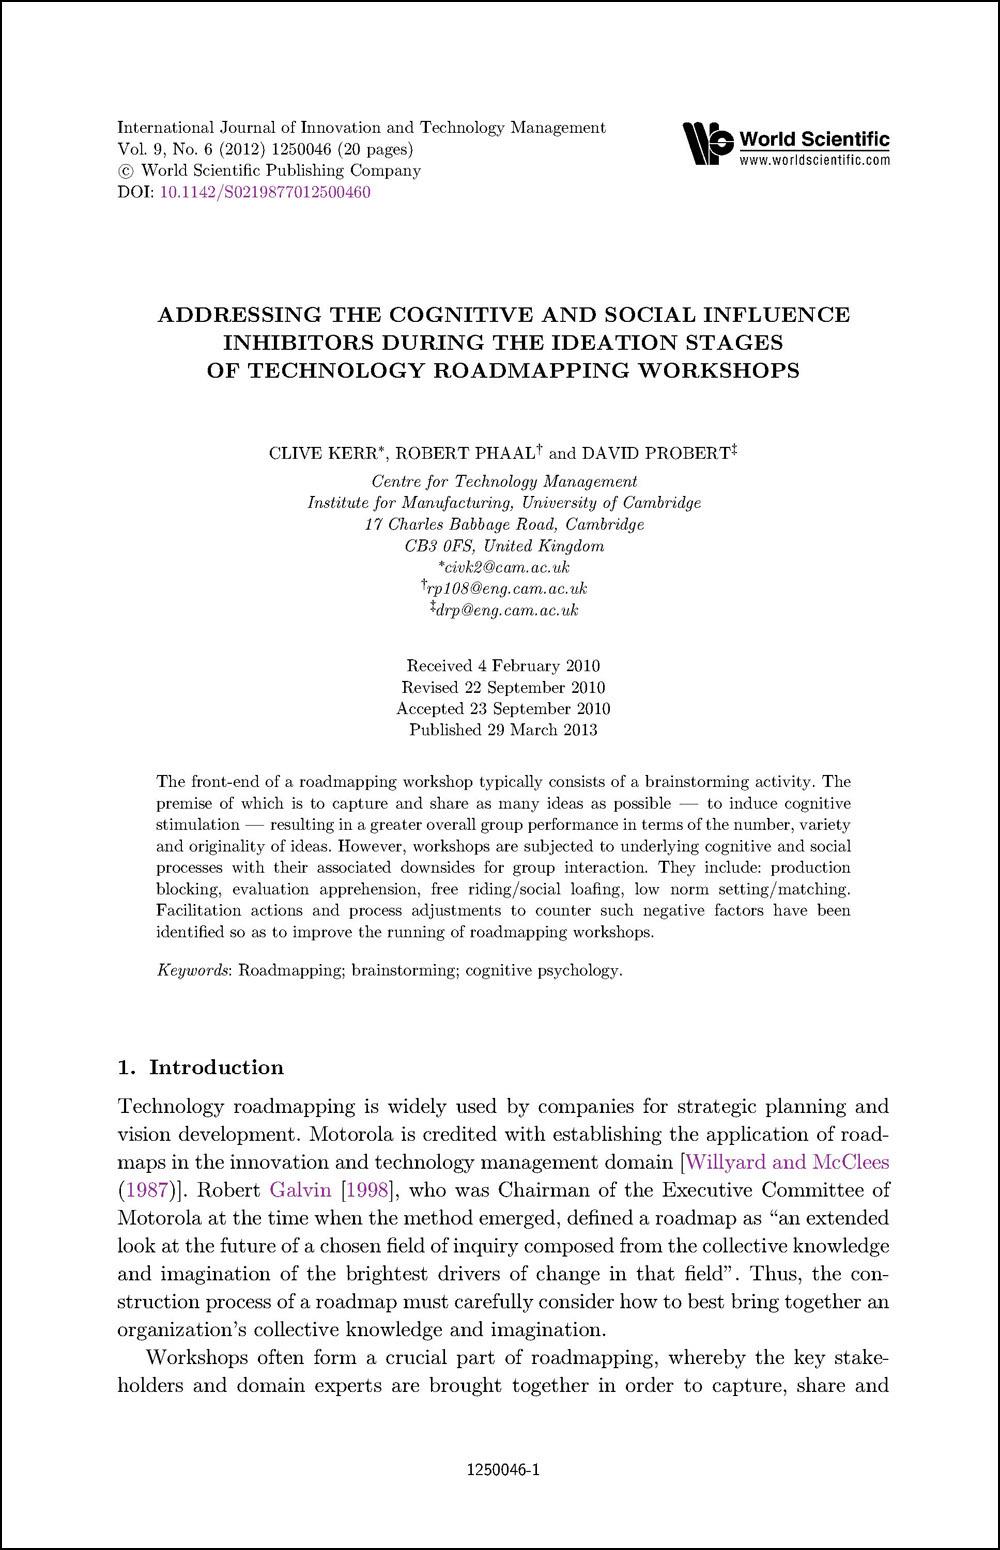 publications-ijitm2012-6.jpg